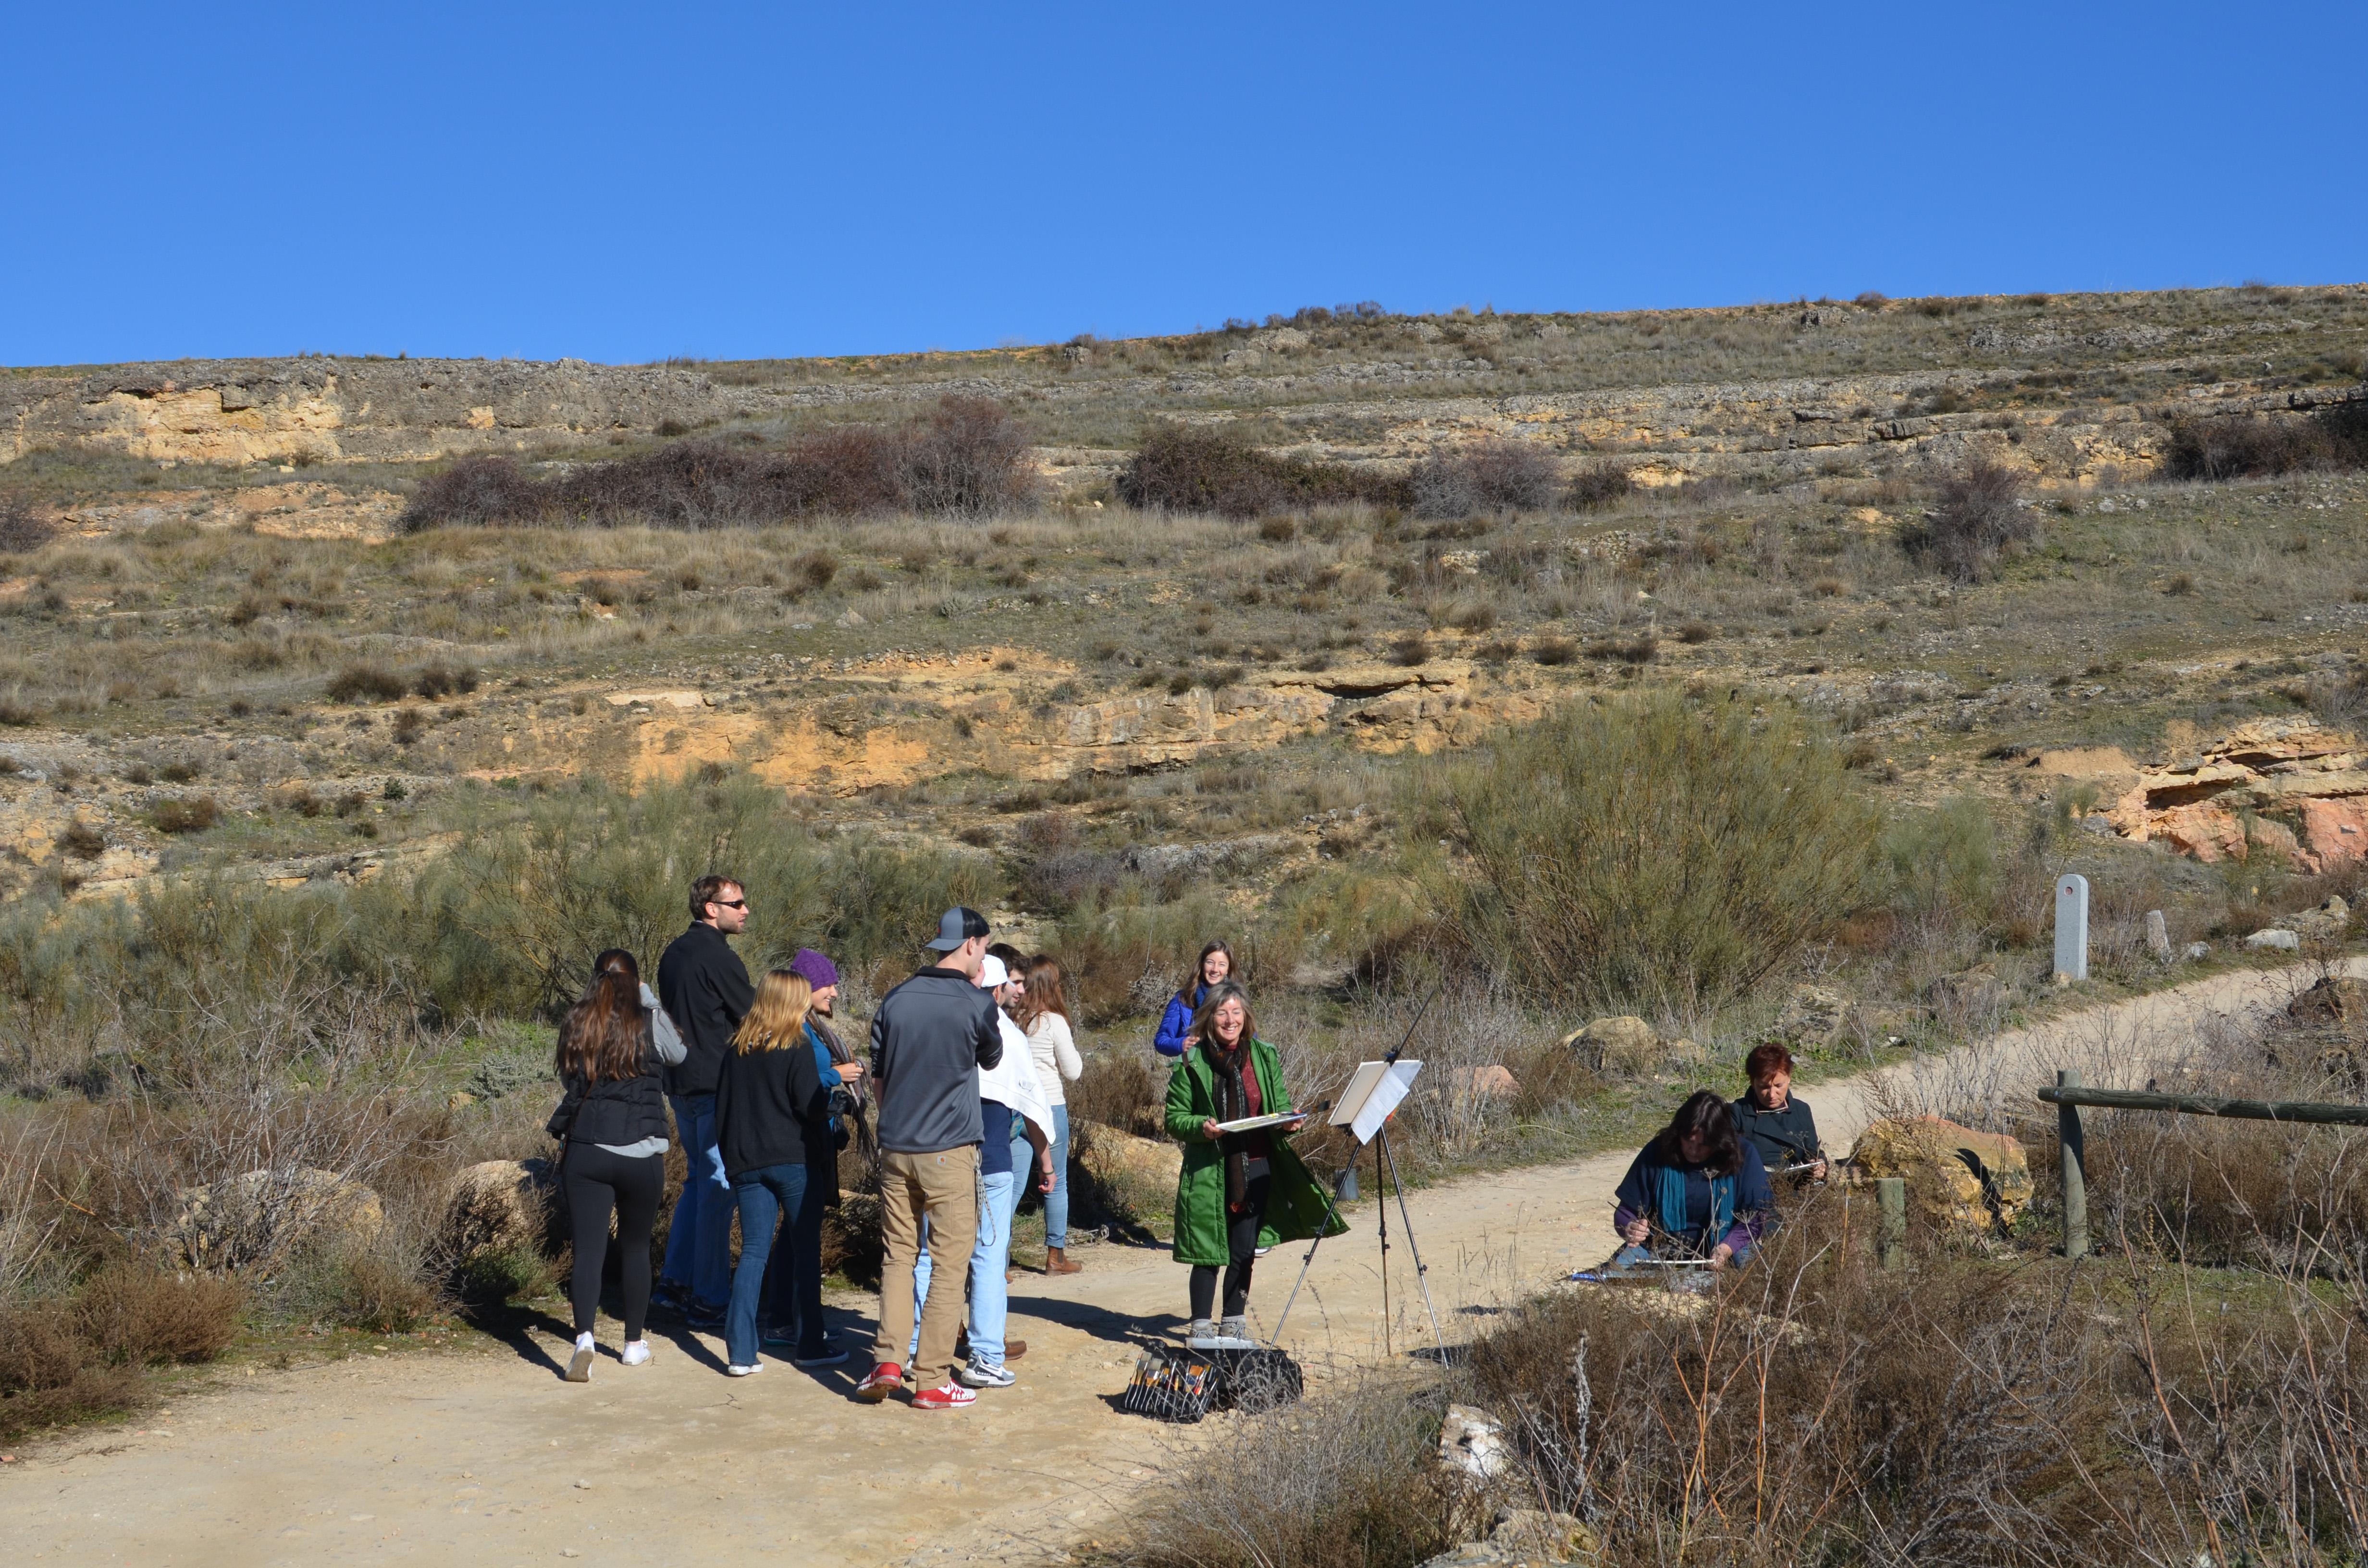 Proctor en Segovia admires local artists